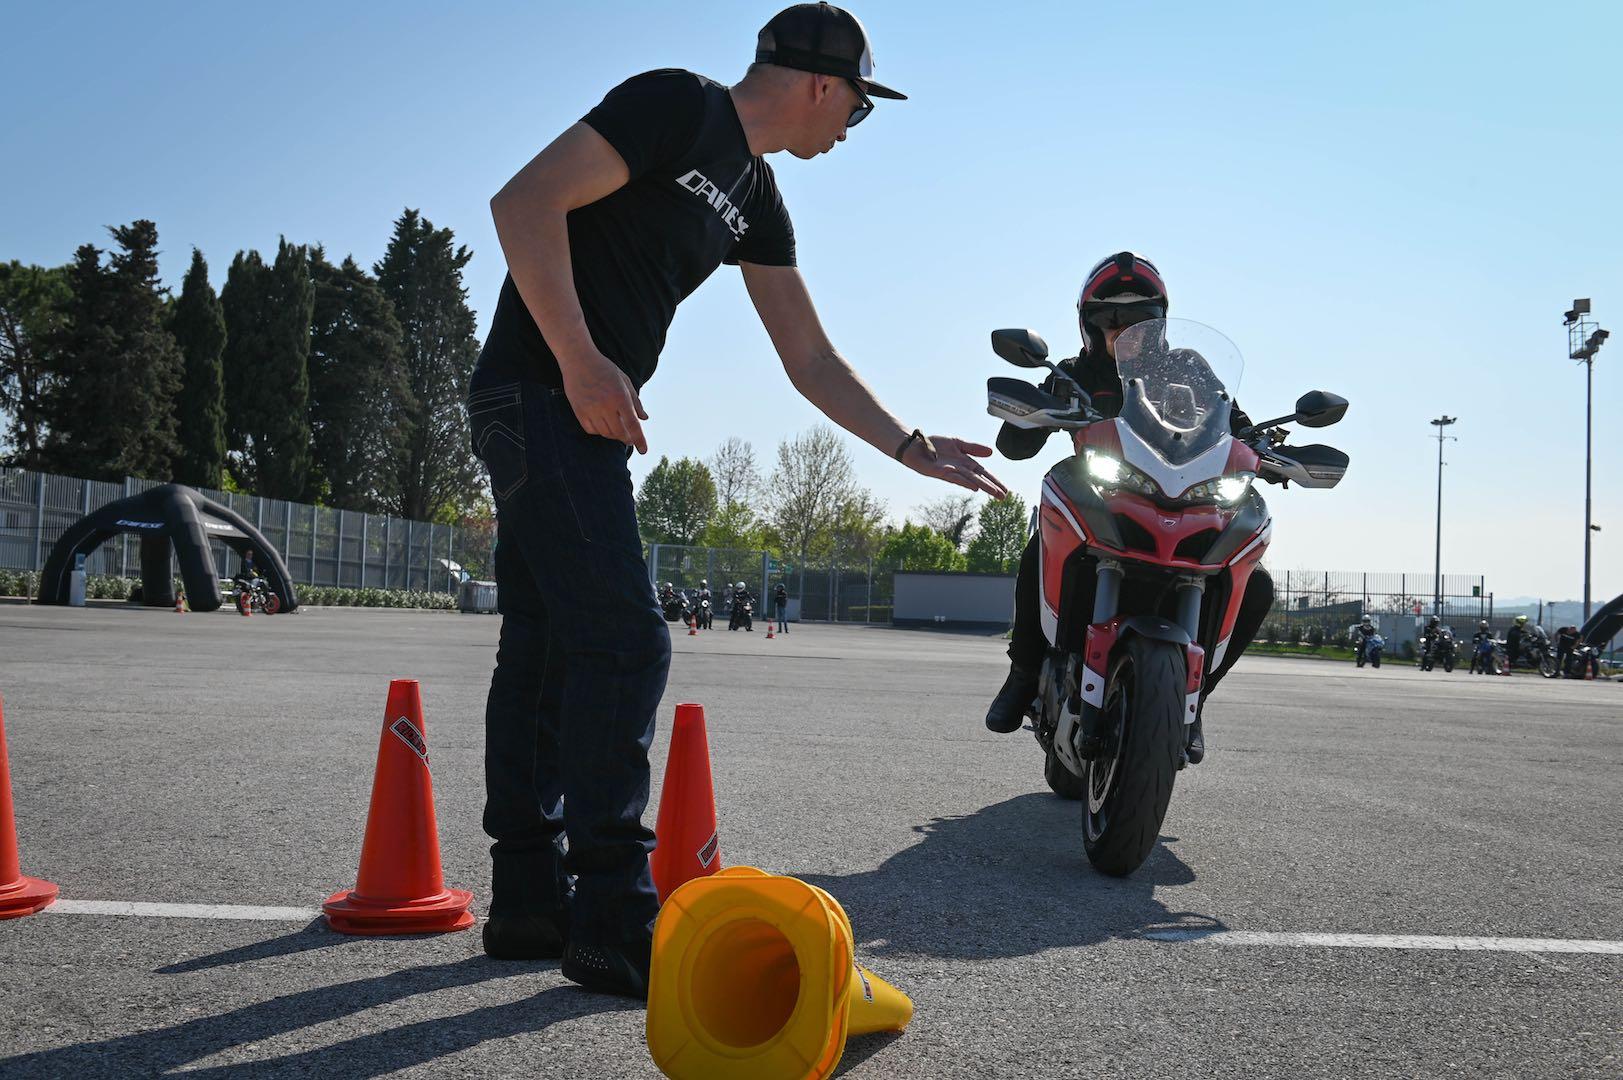 Dainese Riding Master School